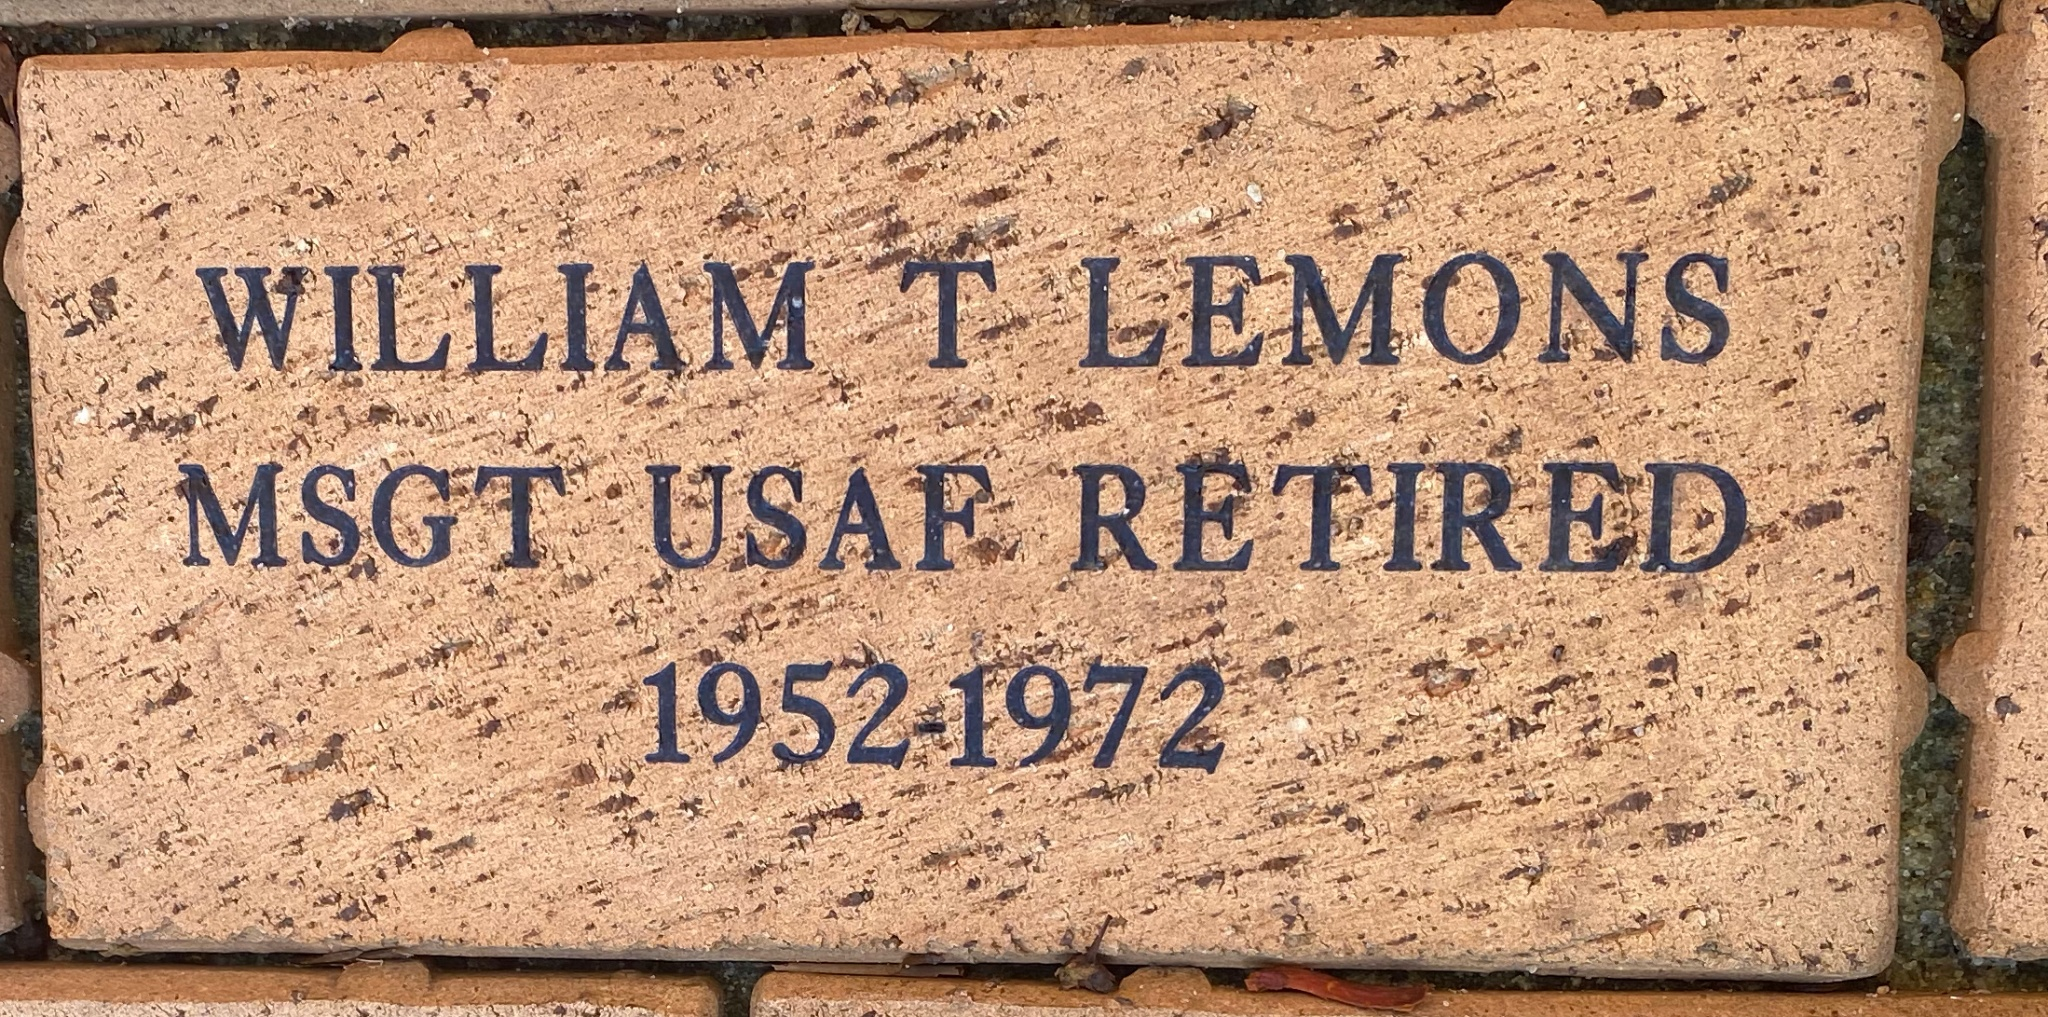 WILLIAM T LEMONS MSGT USAF RETIRED 1952-1972